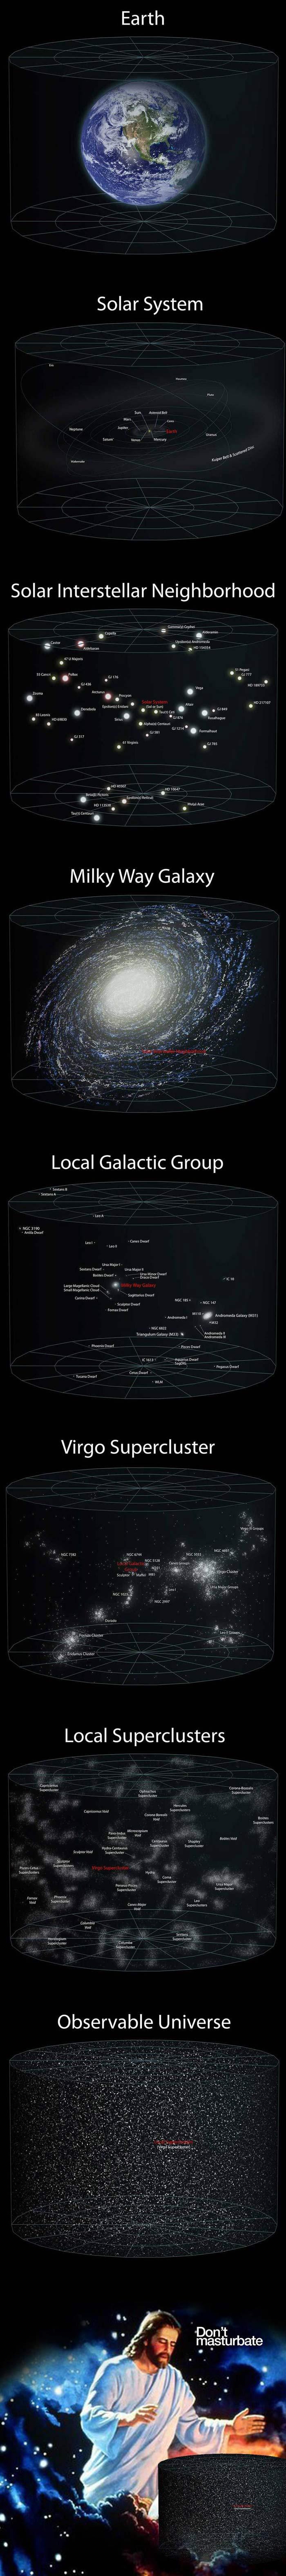 the-religious-universe